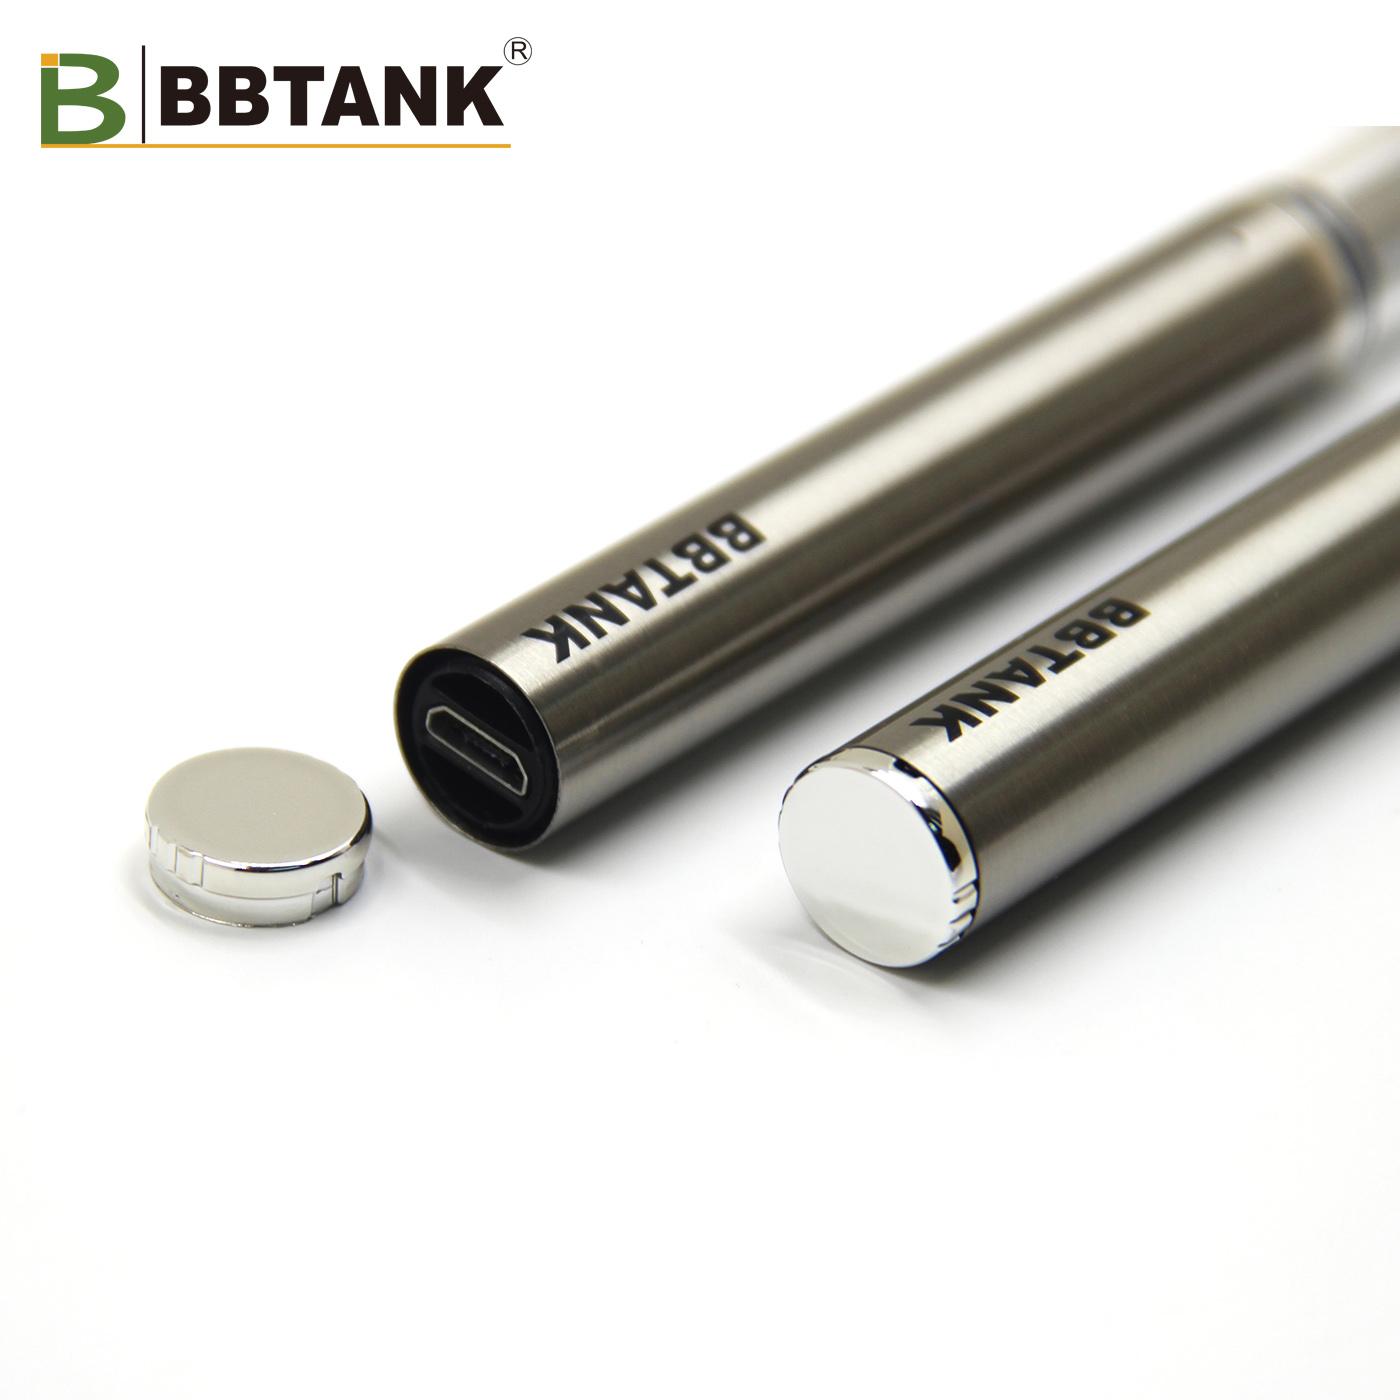 Bbtank Cbd Thick Oil Disposable Cartridge With Bottom Usb Charger,Bbtank  C530r Buttonless Vape Pen Cbd Oil Atomizers - Buy Cbd Thick Oil Disposable